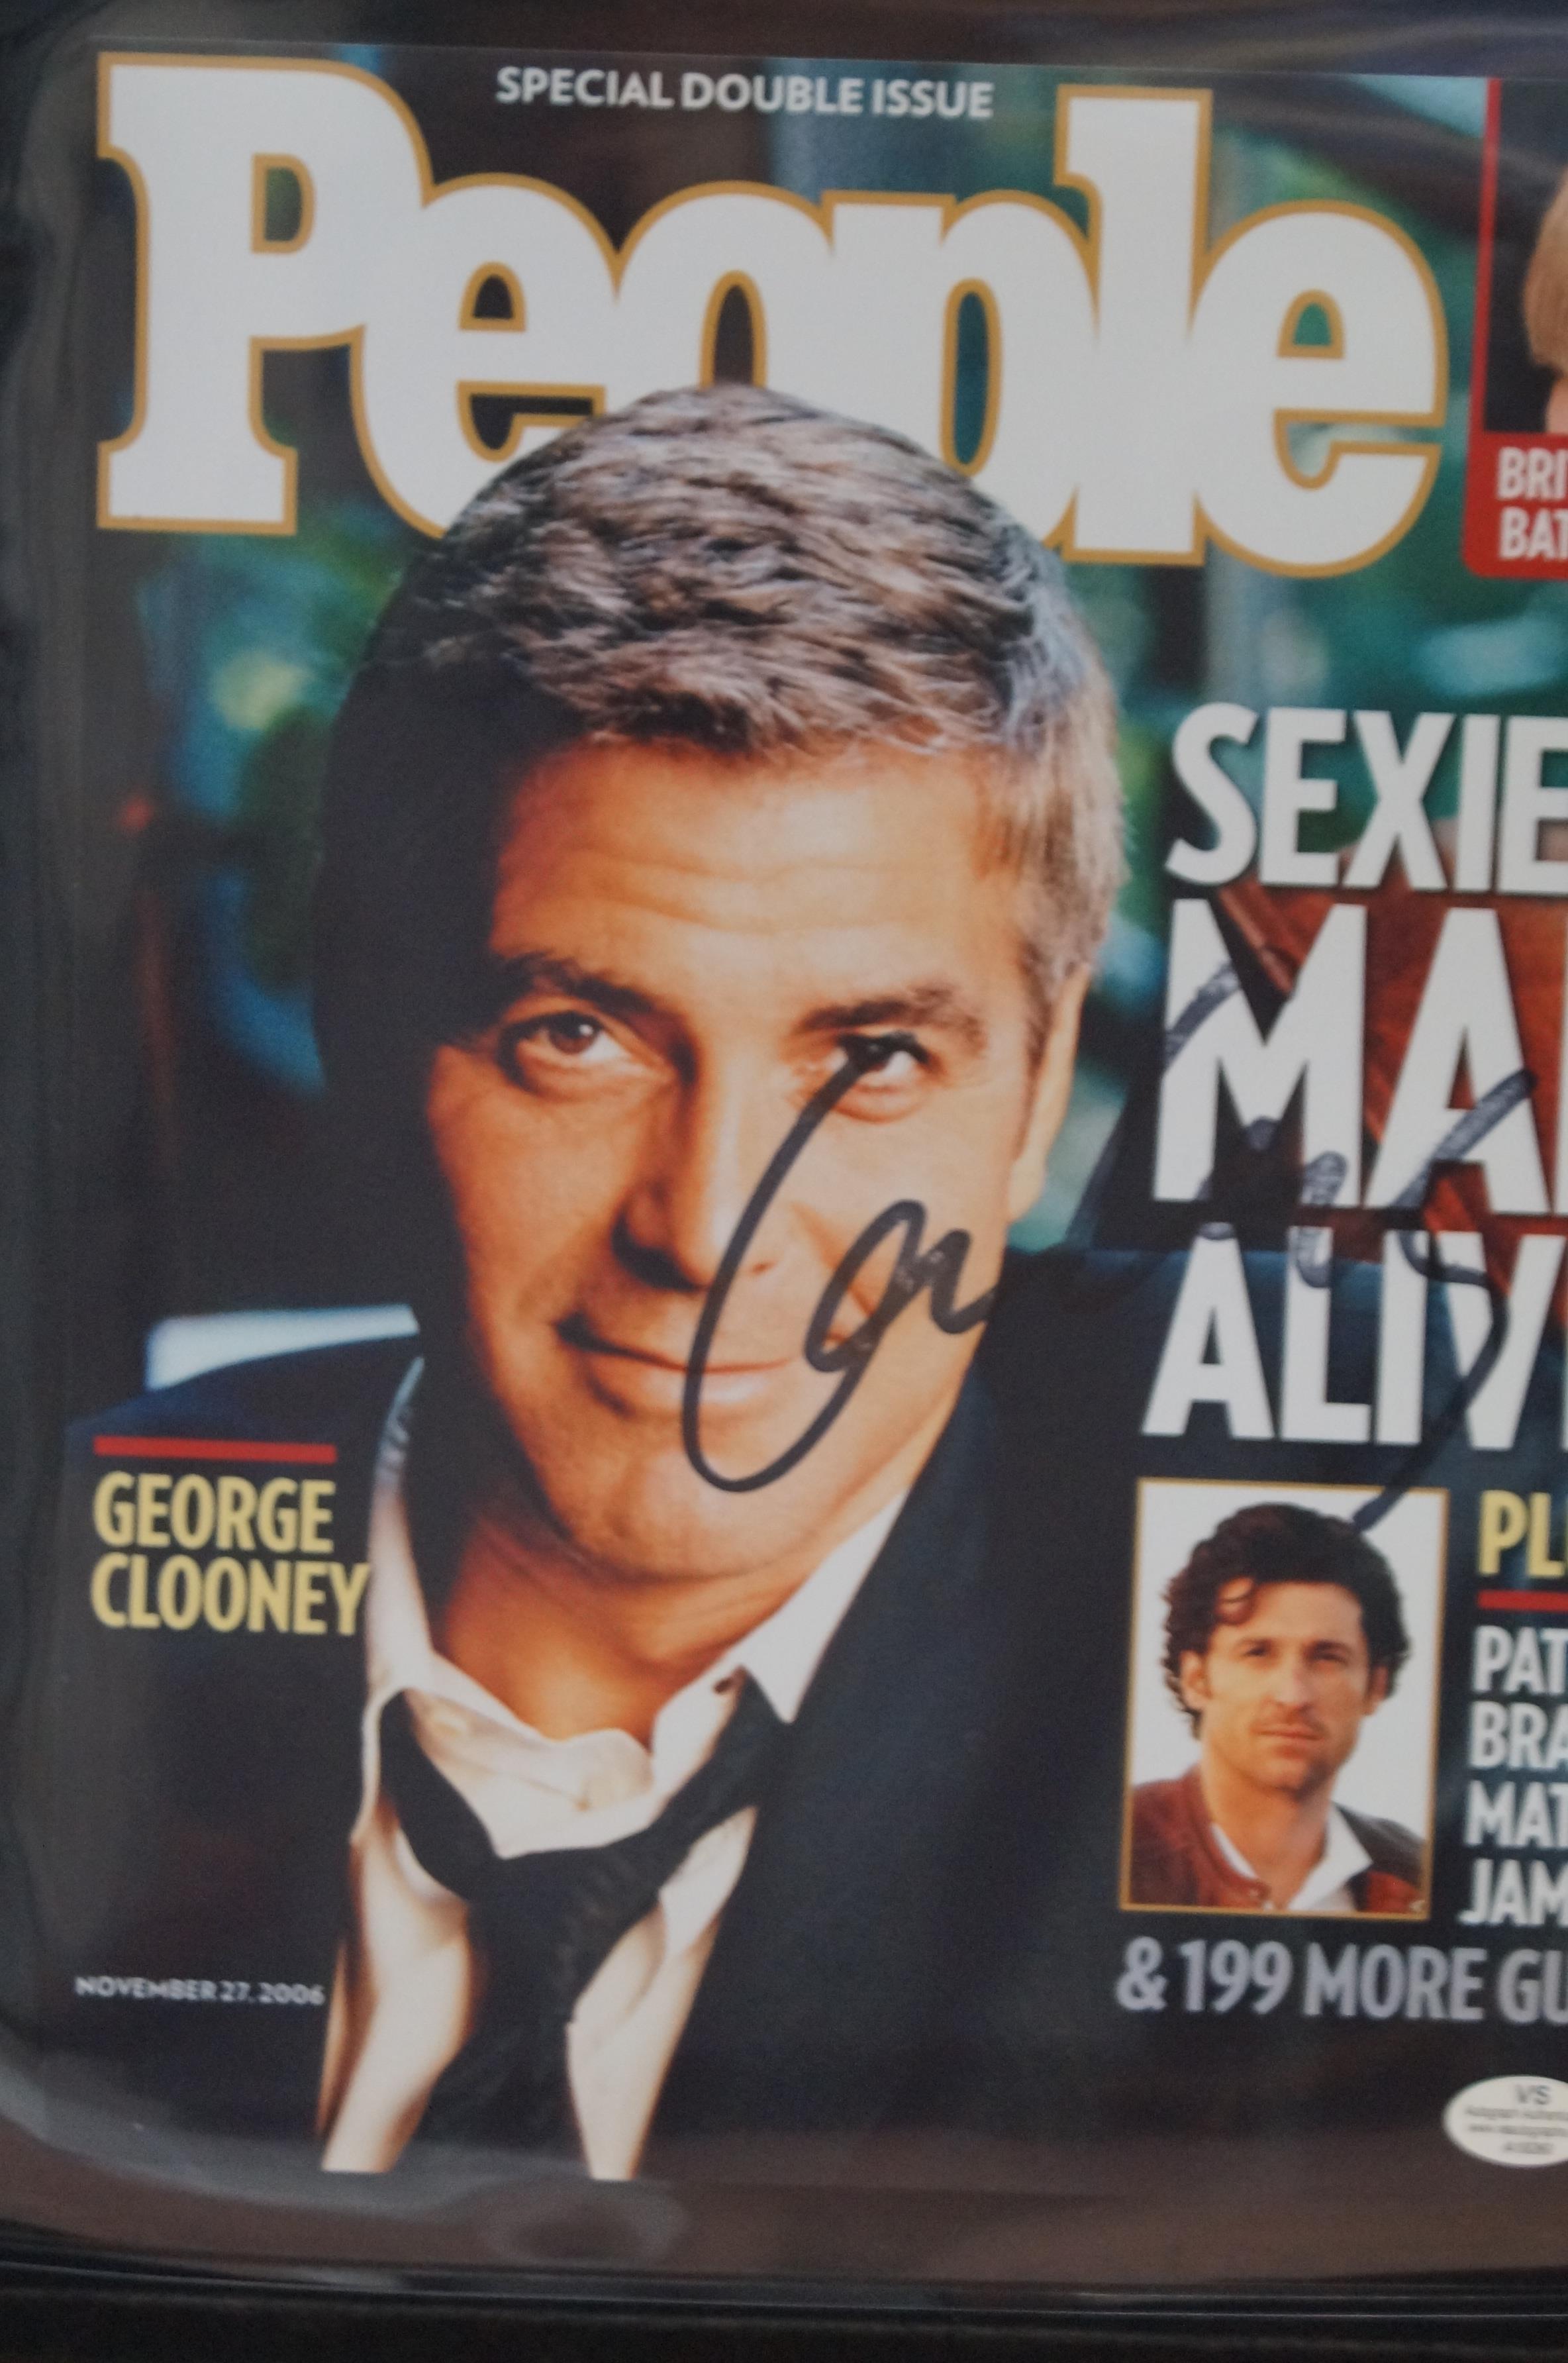 Lot 196 - George Clooney autograph coa from vsautographs.com